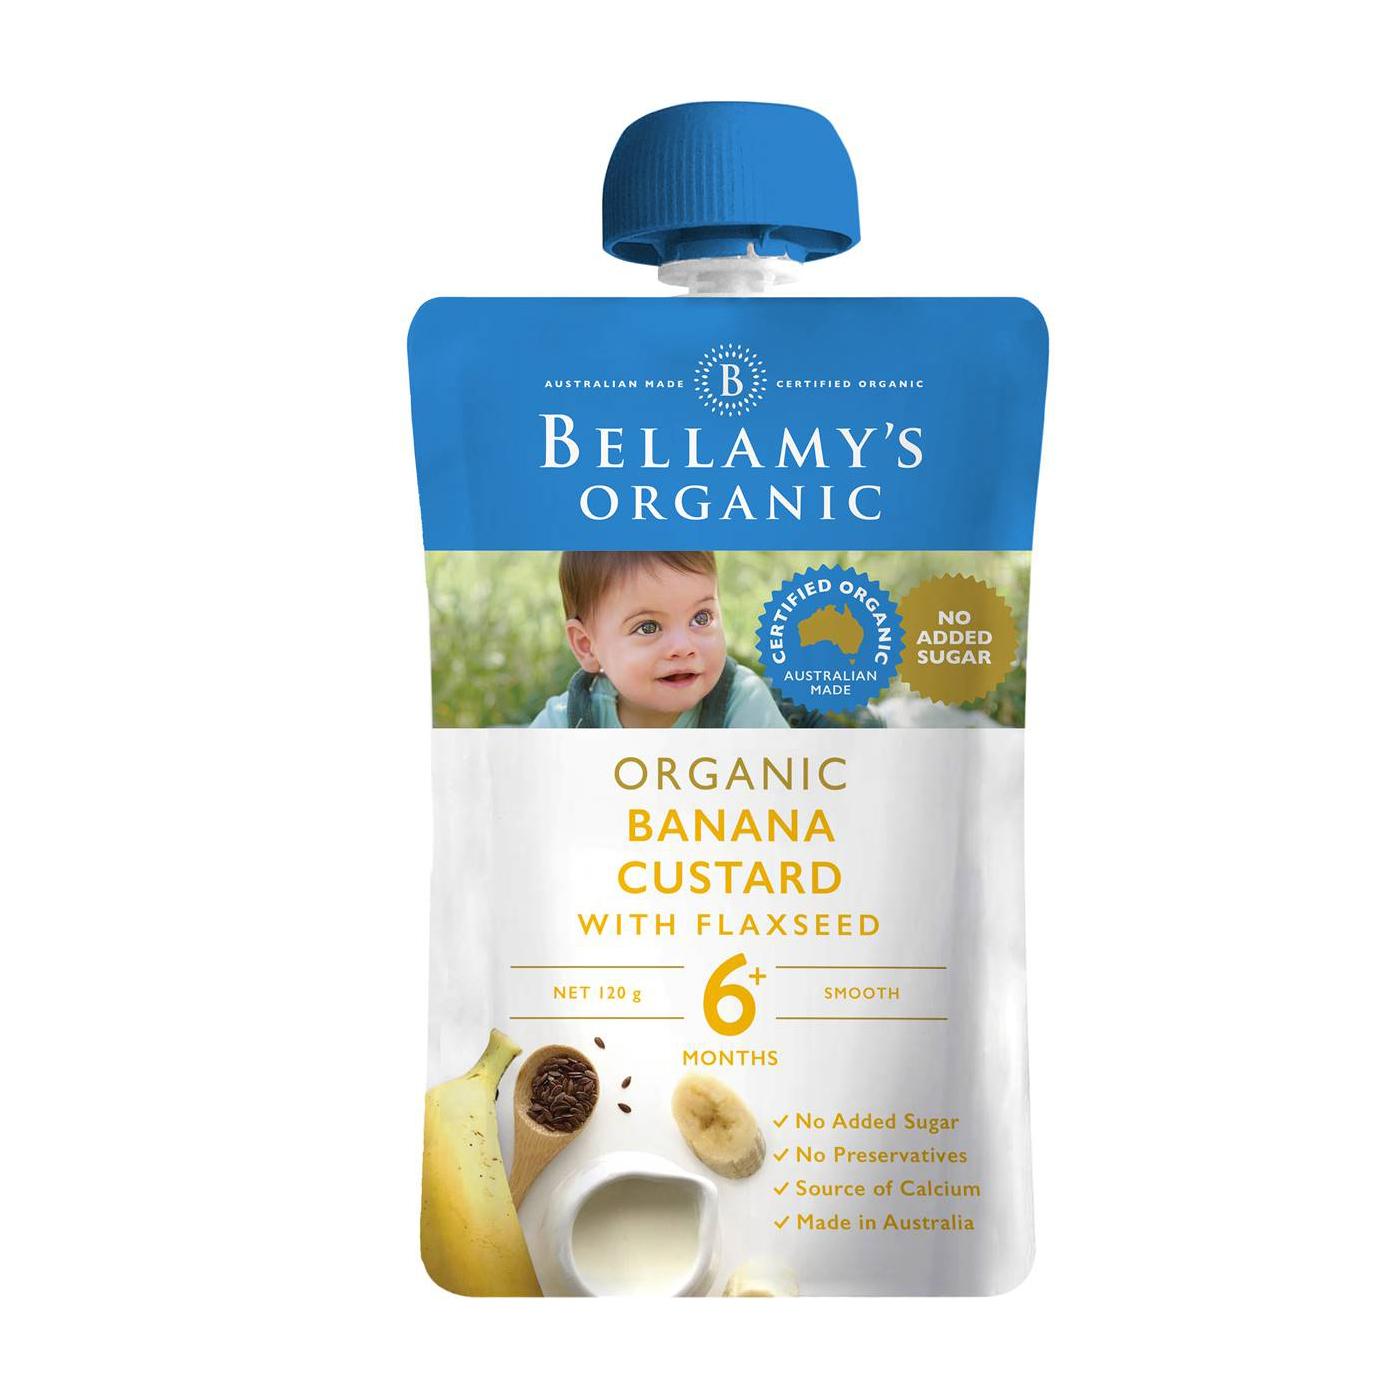 Bellamy's Organic Banana Custard With Flaxseed 6 Months 120g